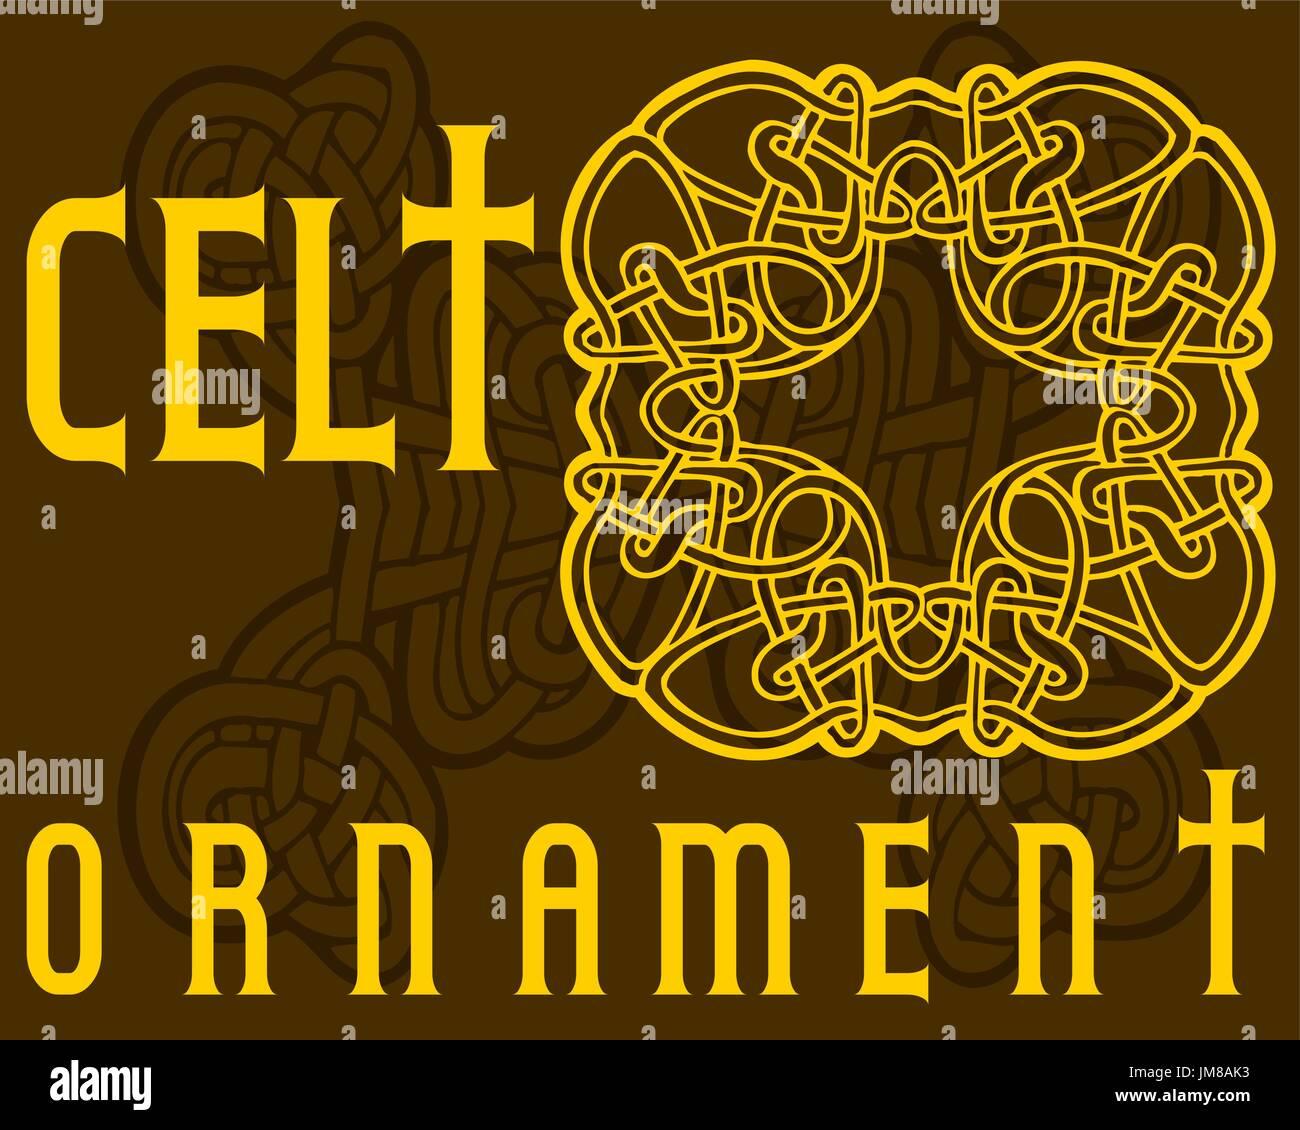 Decorative Celtic ornament for your designs - Stock Vector